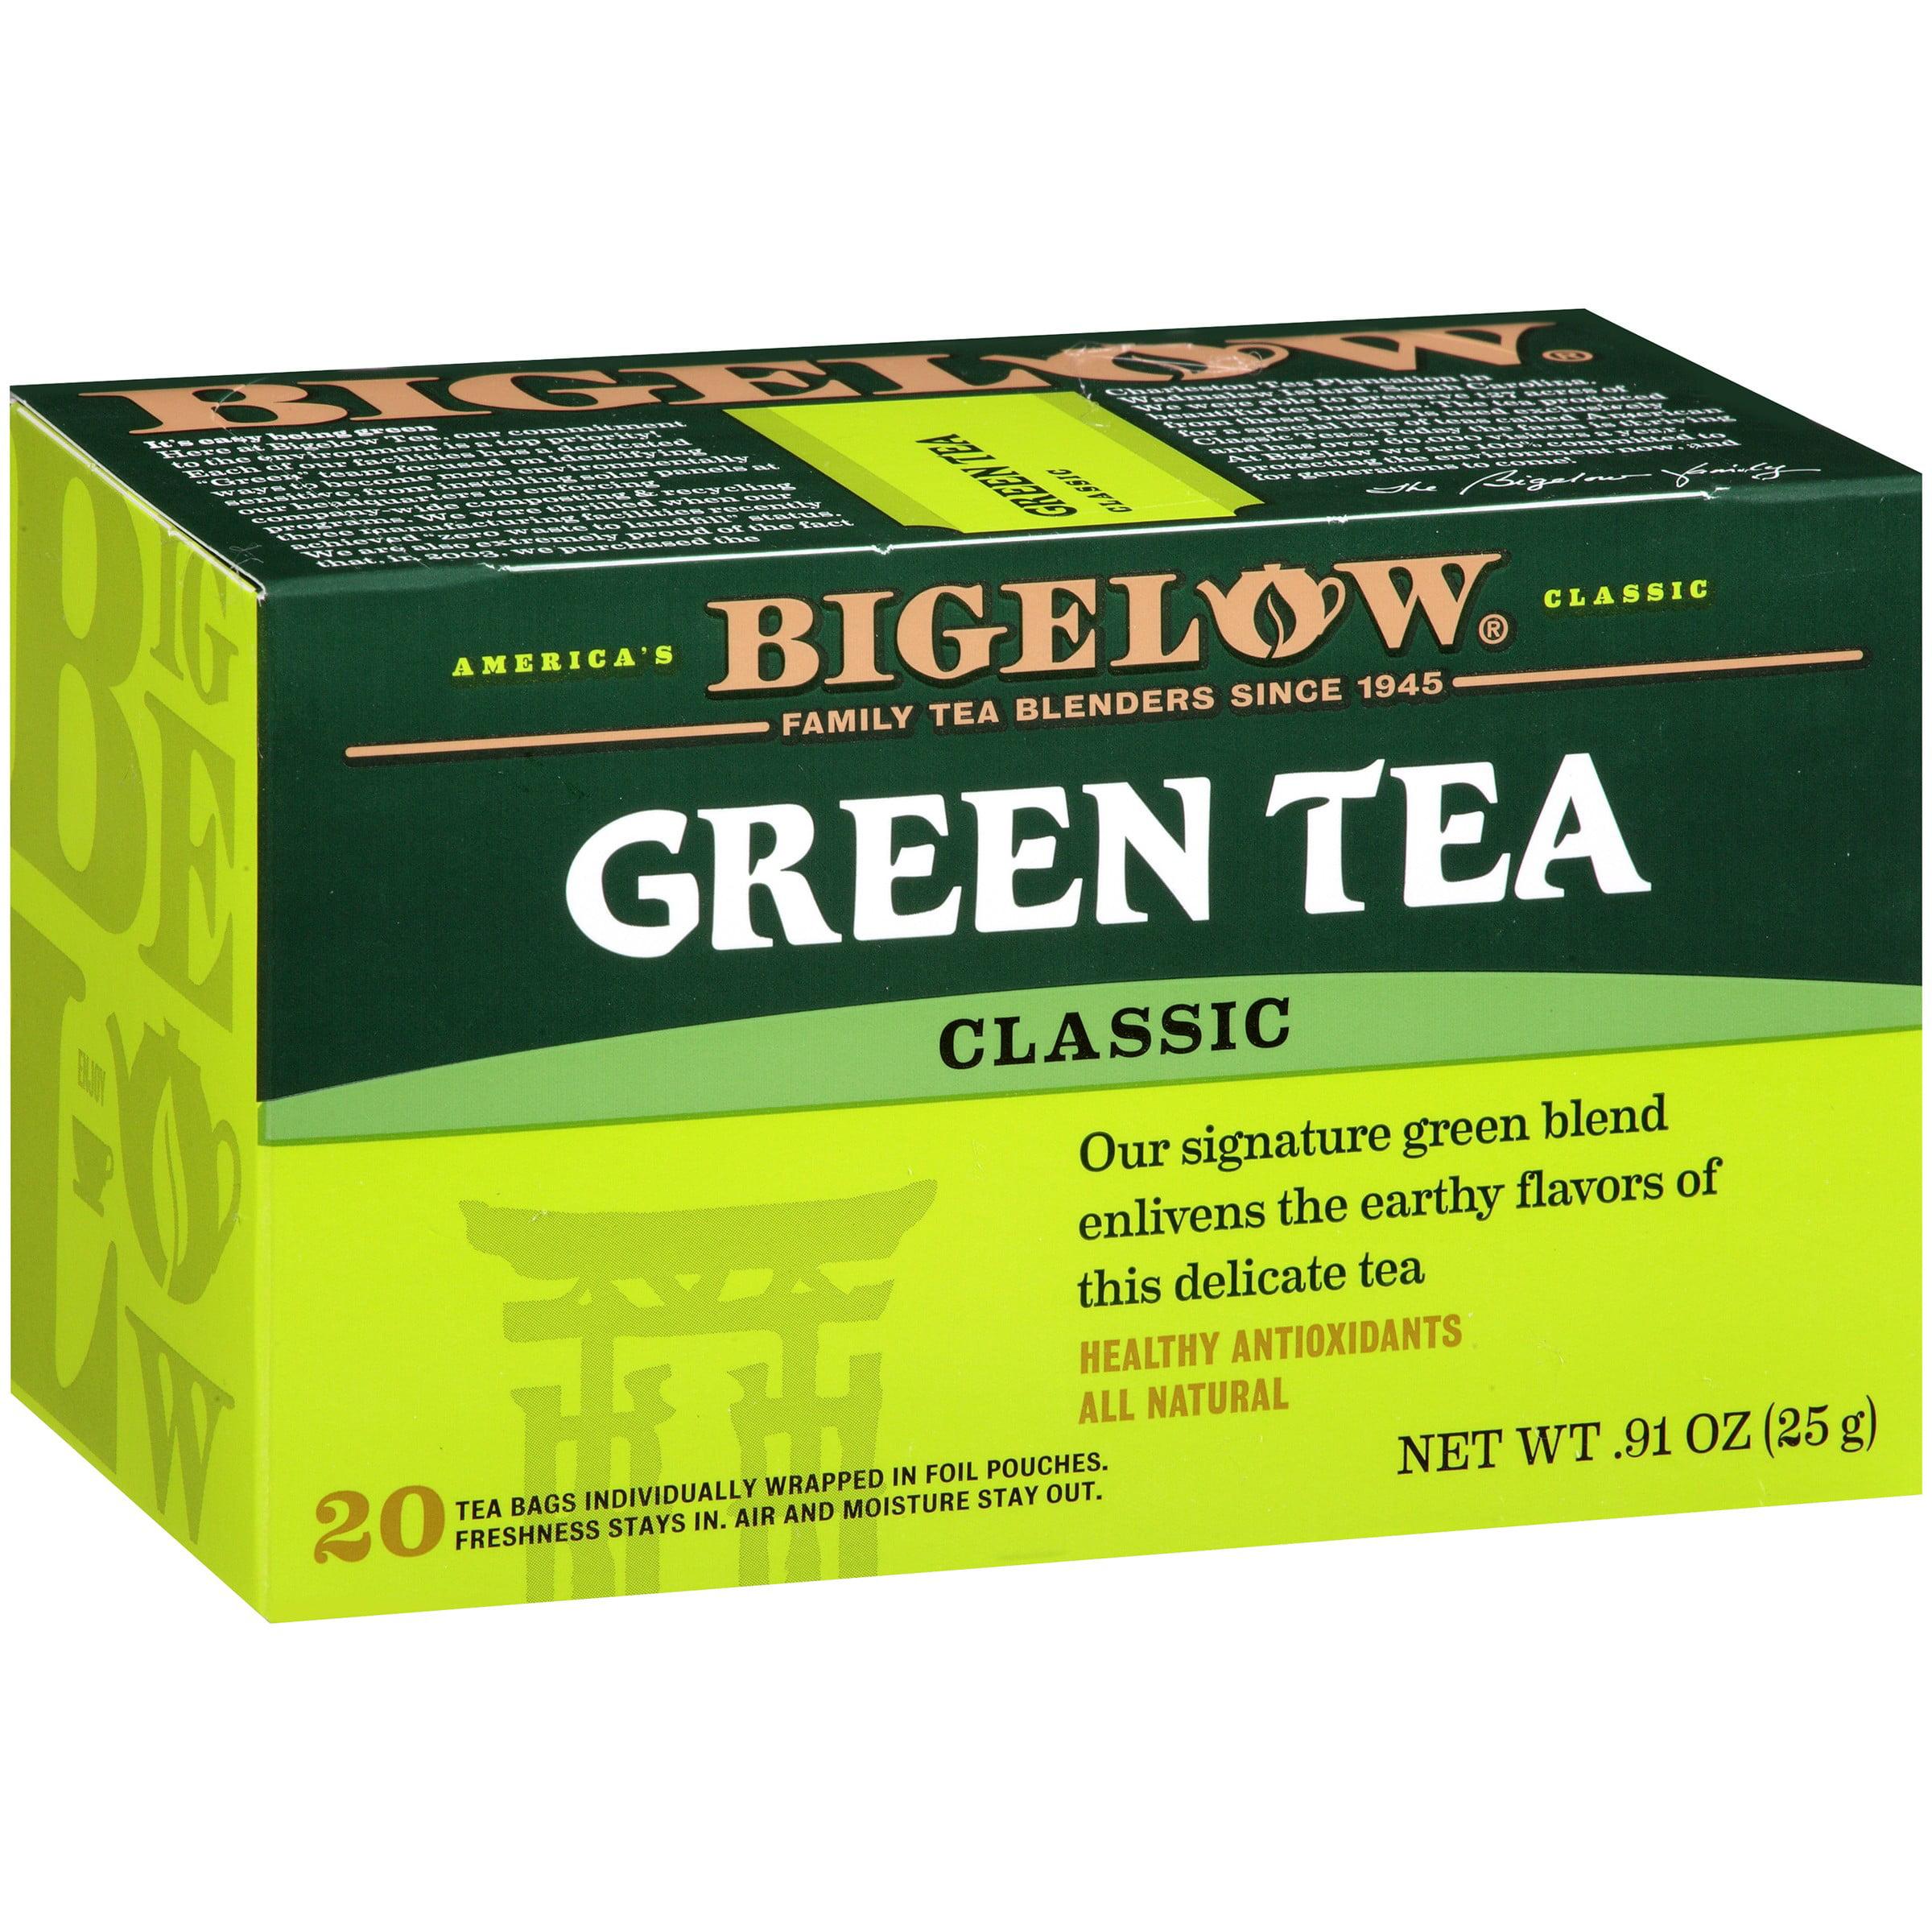 Bigelow Green Tea Classic 20 CT by RC Bigelow, Inc.©